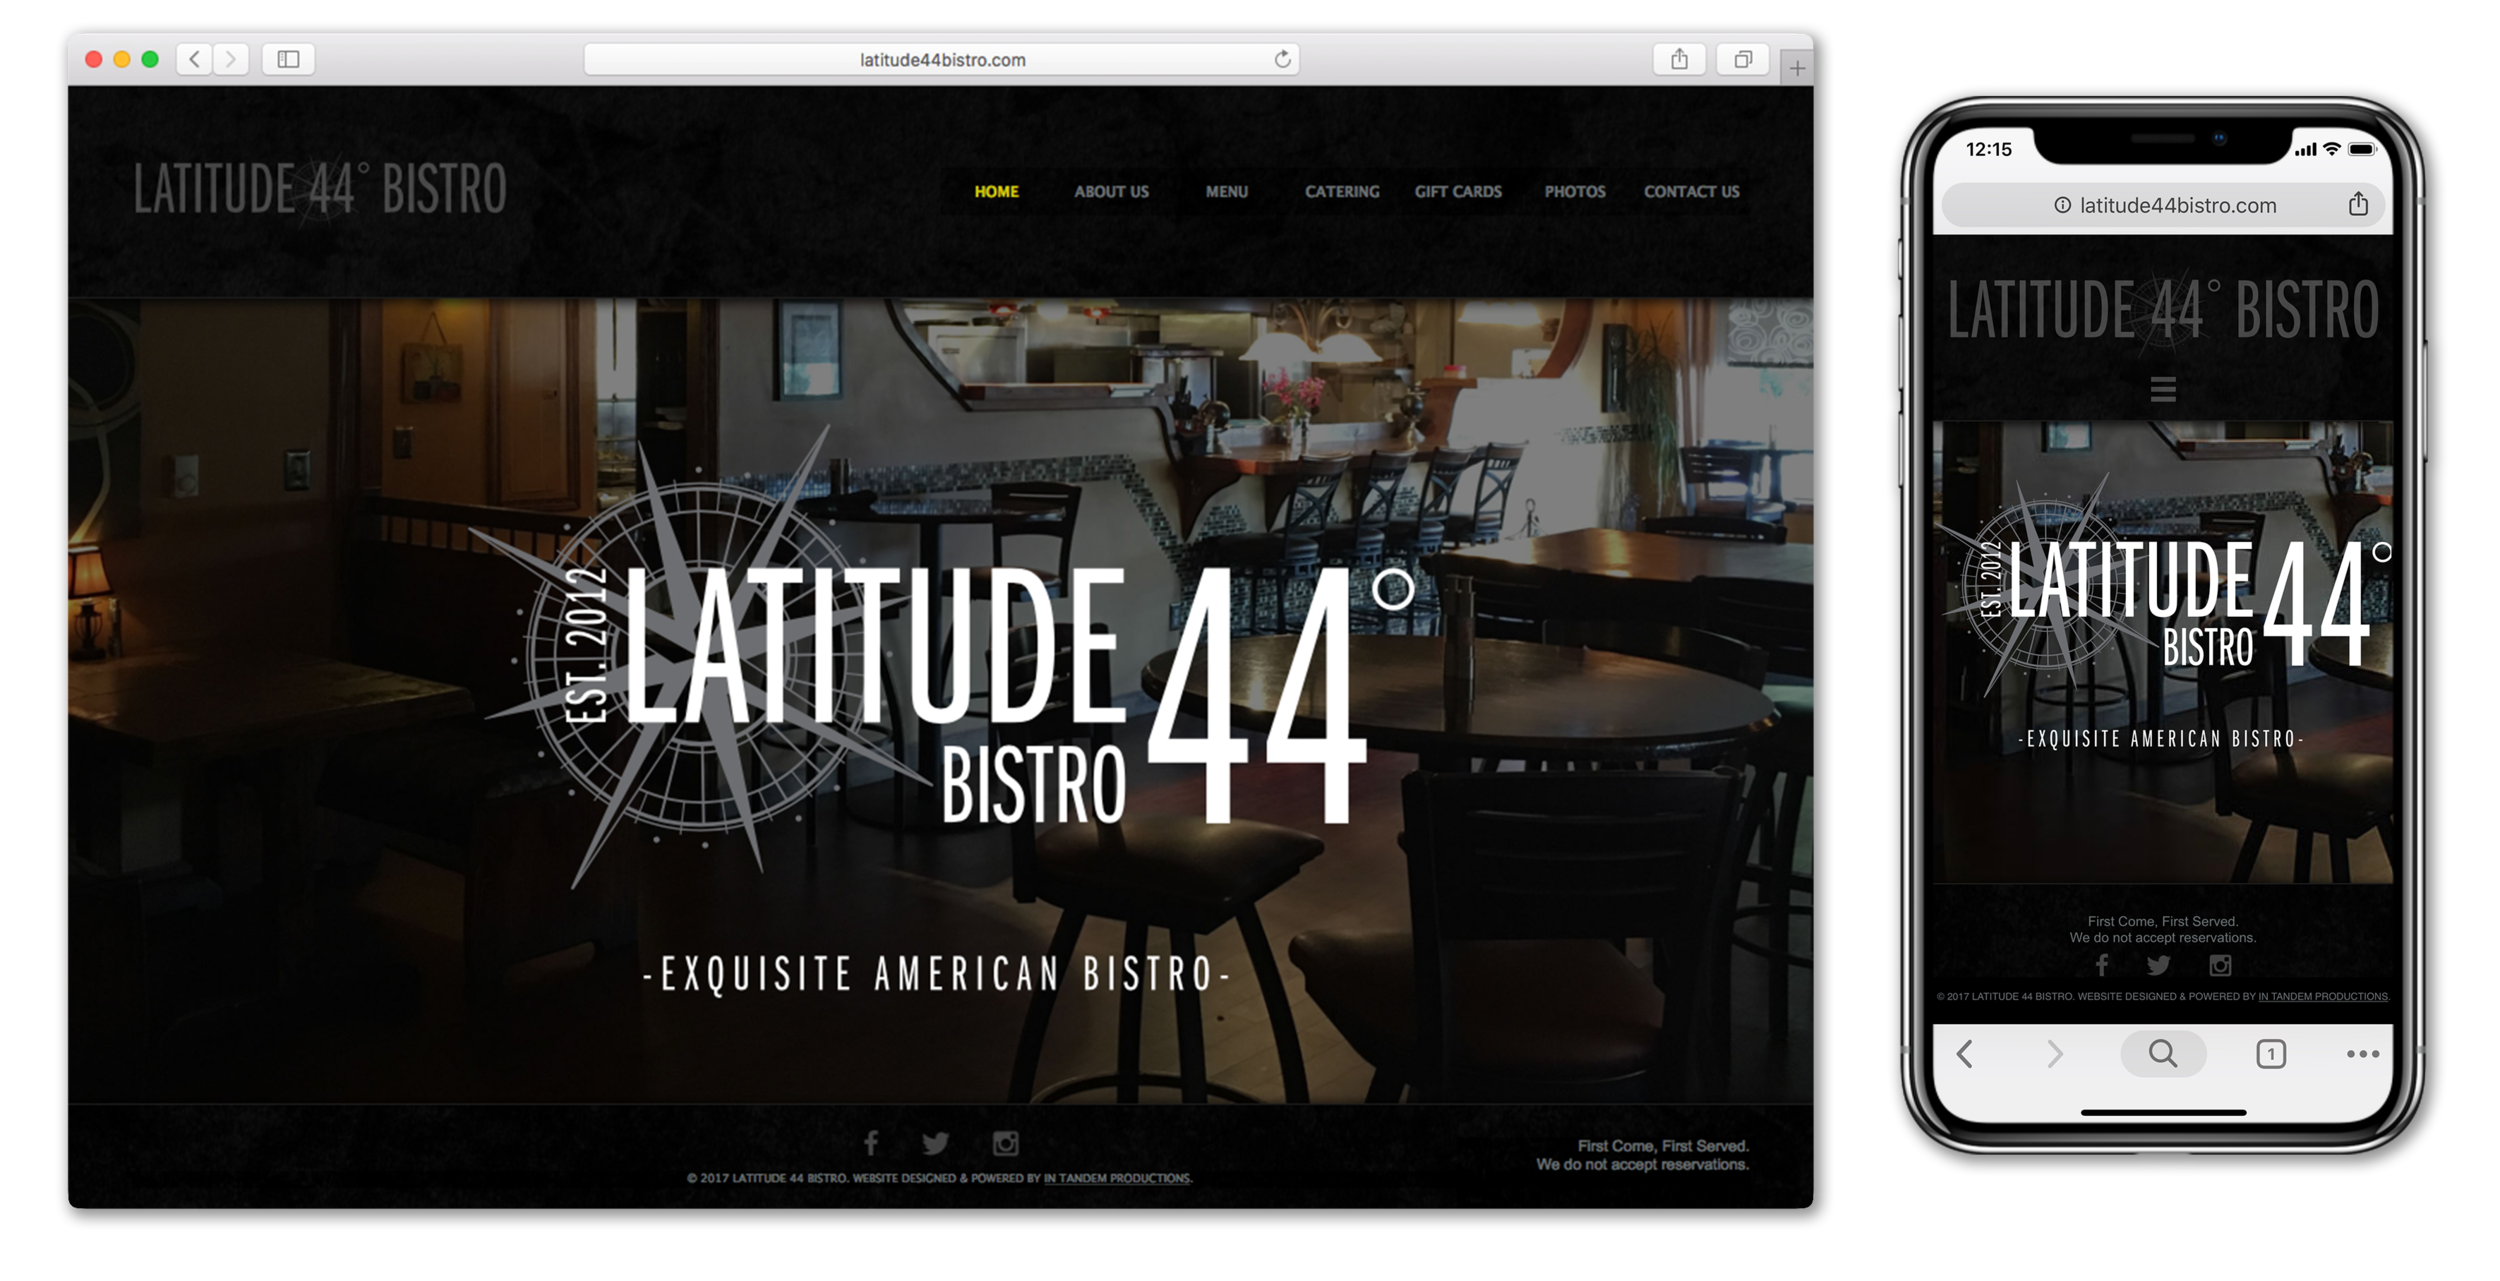 Latitude 44 Bistro Website